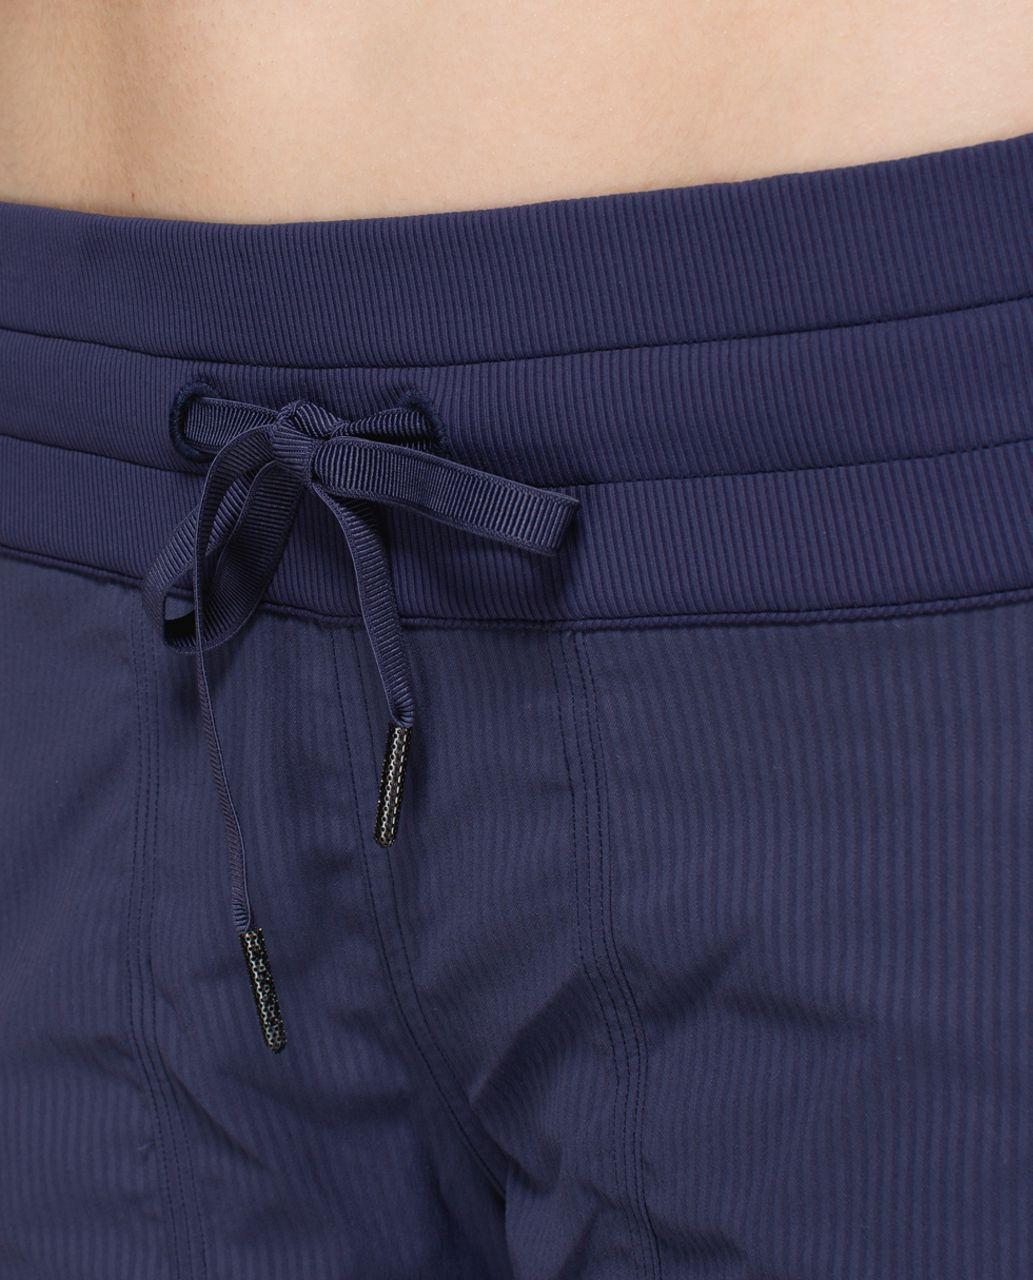 Lululemon Studio Pant II *No Liner (Regular) - Cadet Blue